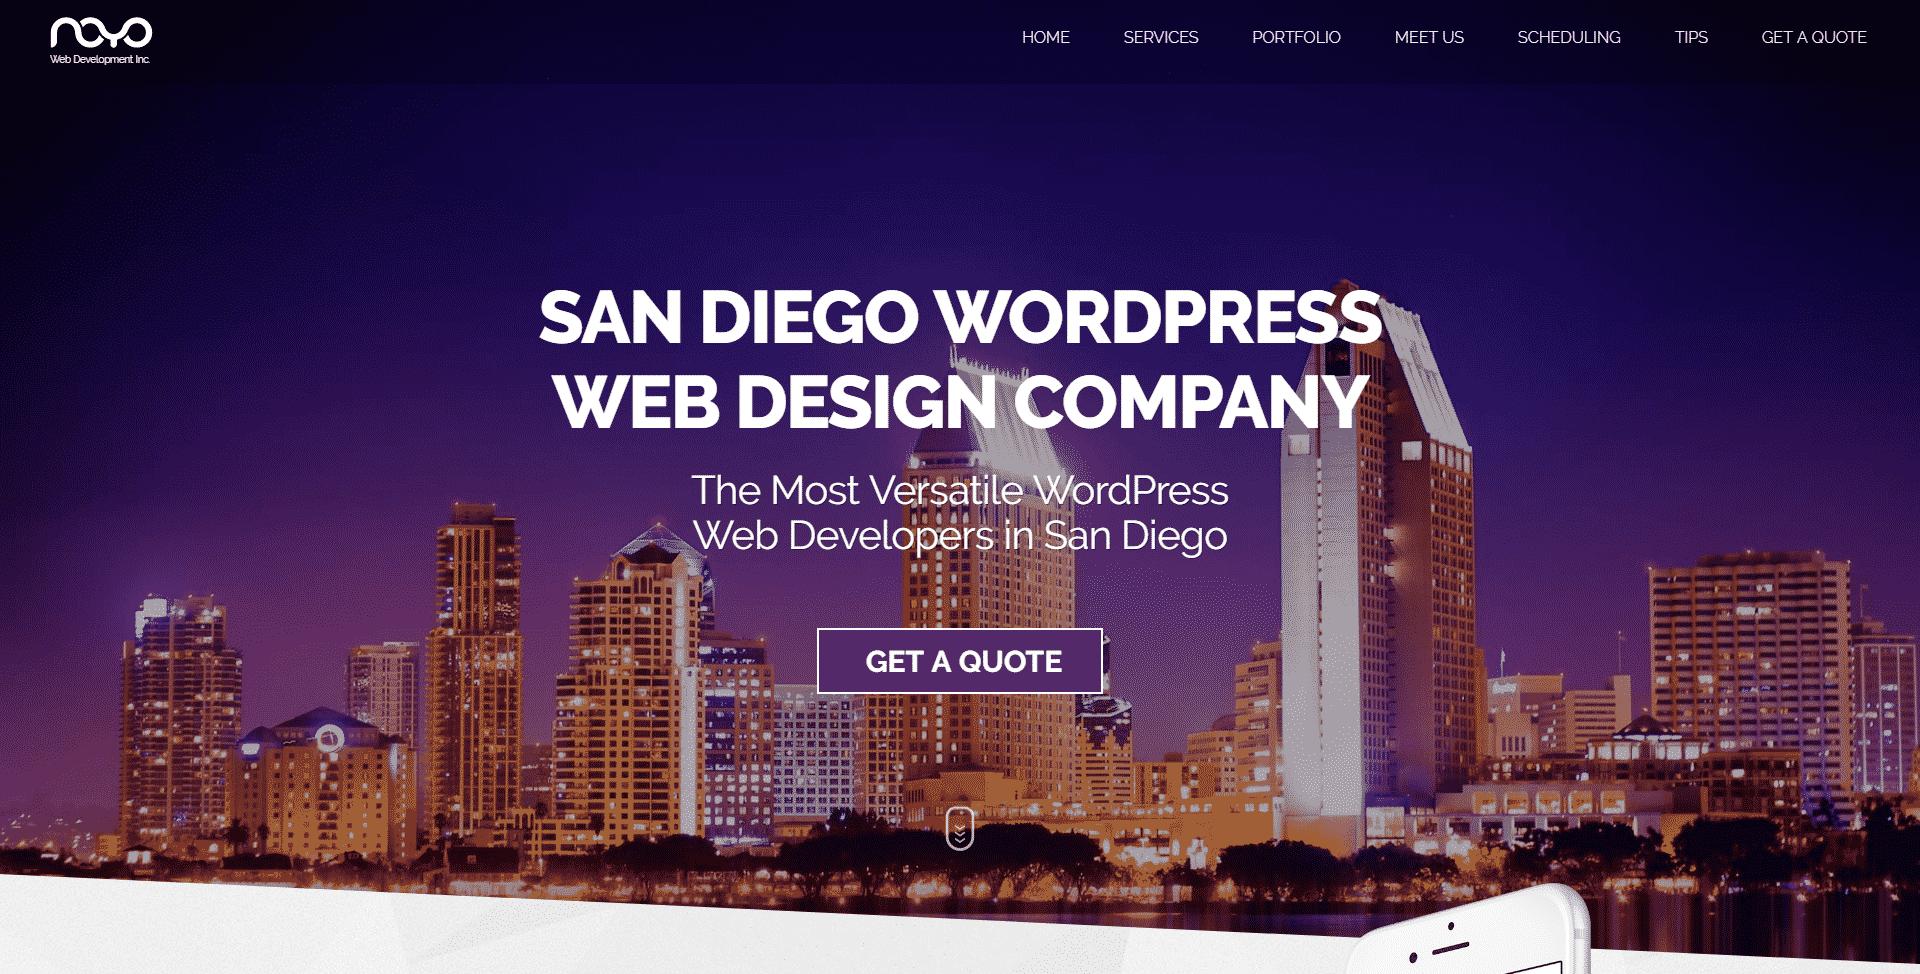 #1 San Diego WordPress Web Design, WordPress Web Developers